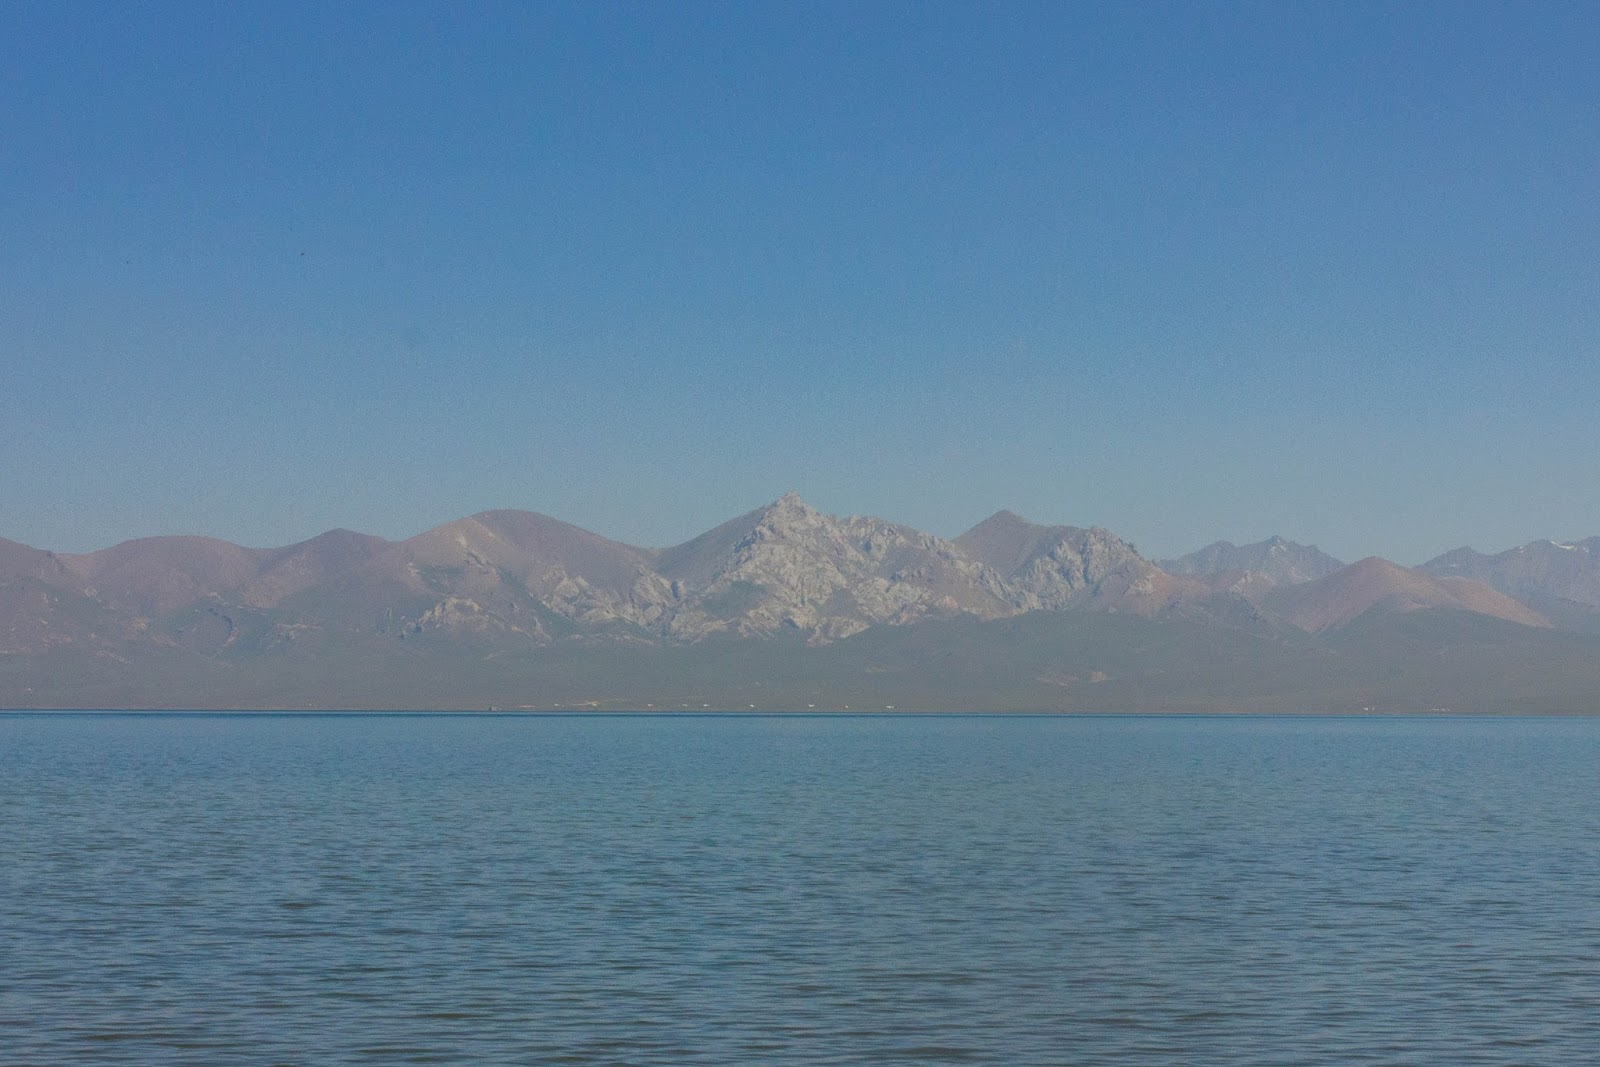 Кыргызские горы, Сон-куль, Озеро